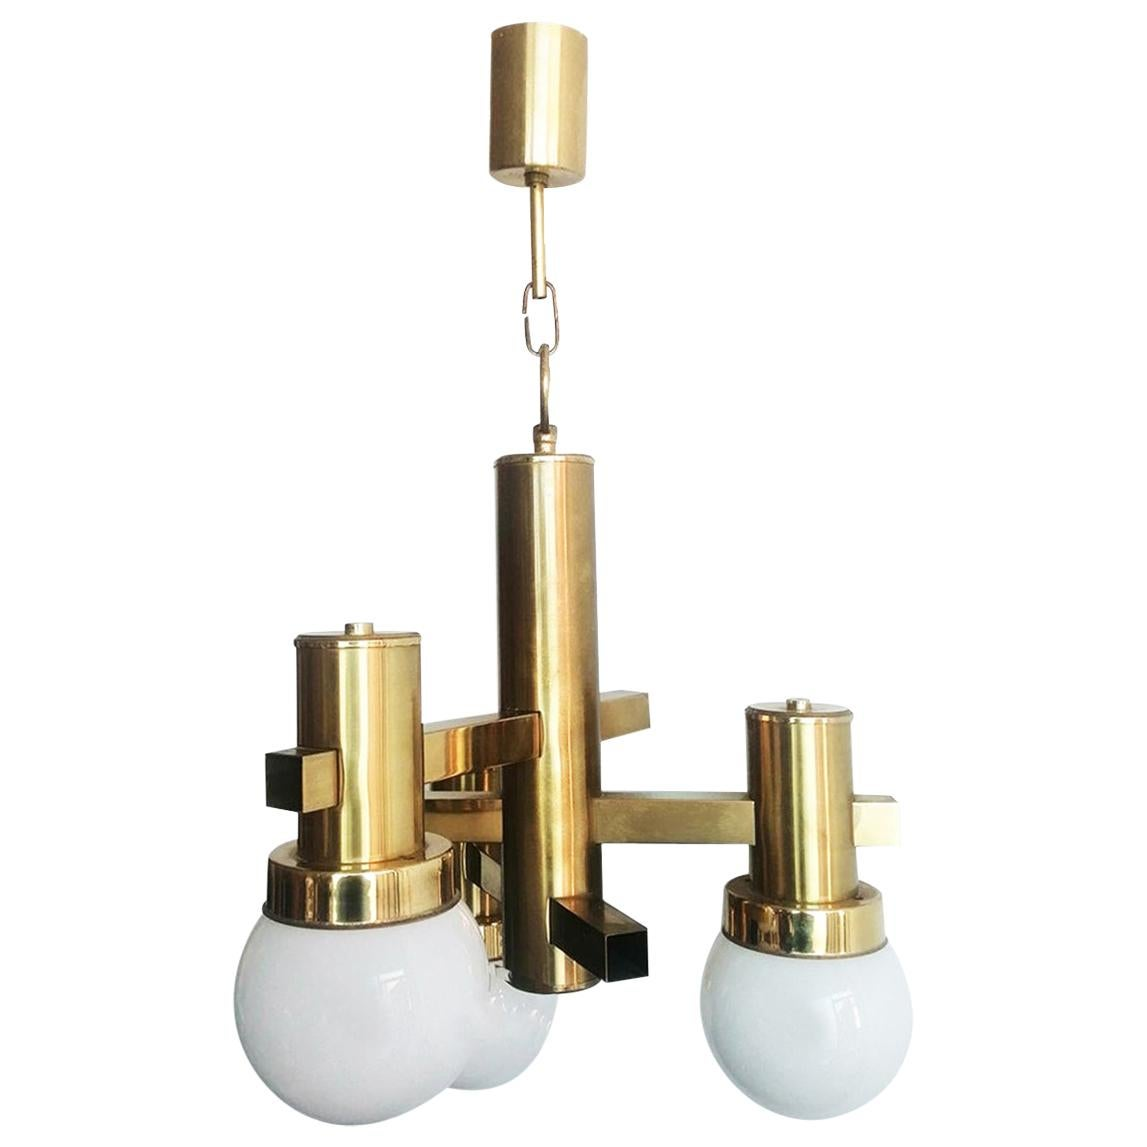 Midcentury Chandelier, Brass and Opaline Glass Sciolari Style, Italy, 1960s